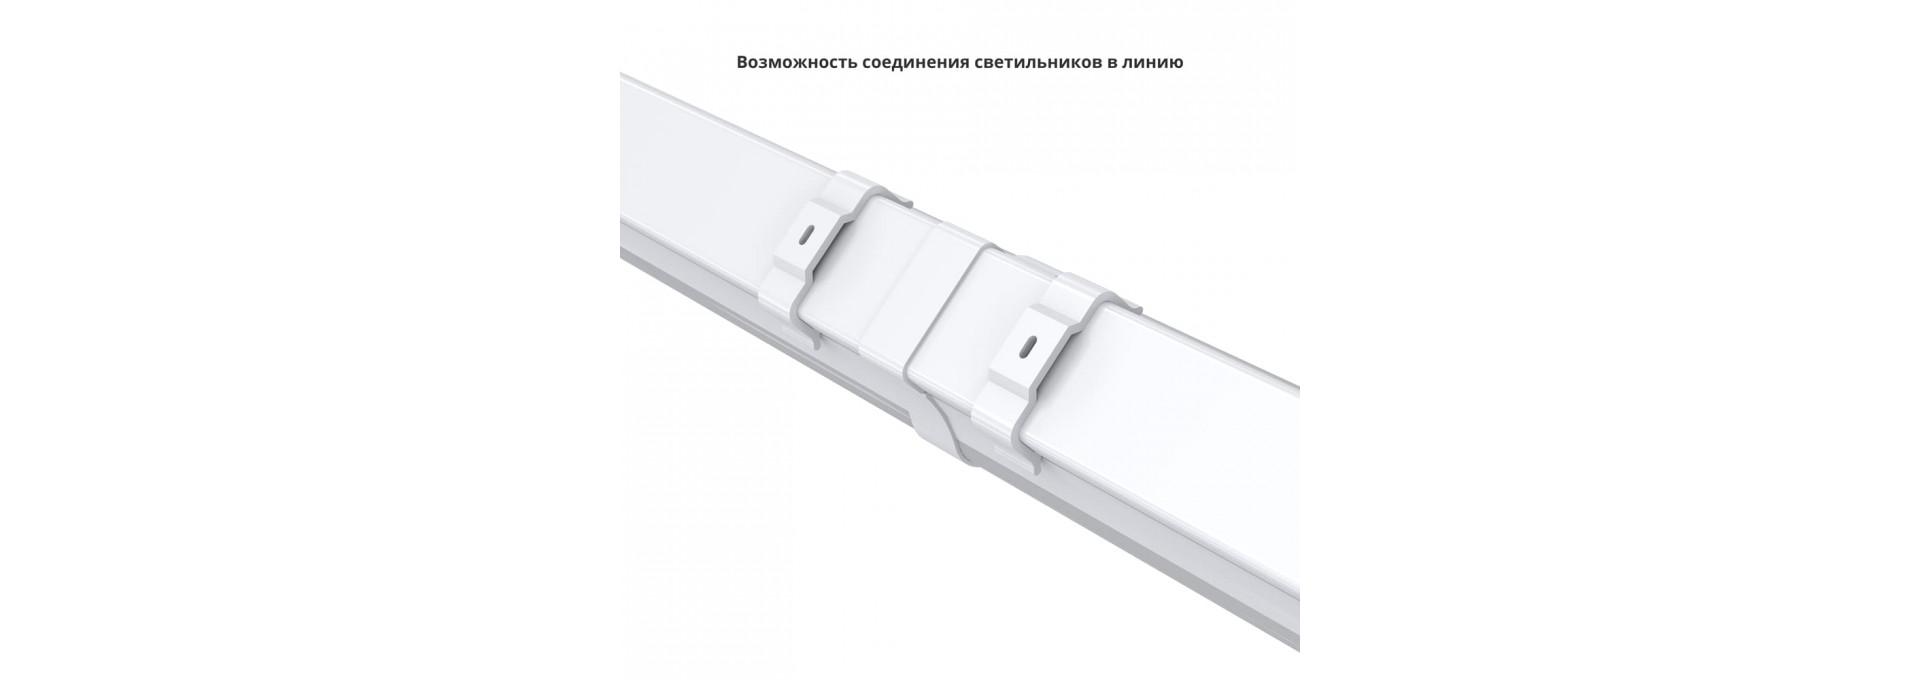 Айсберг v2.0 20 600мм ЭКО Л 4000К Опал